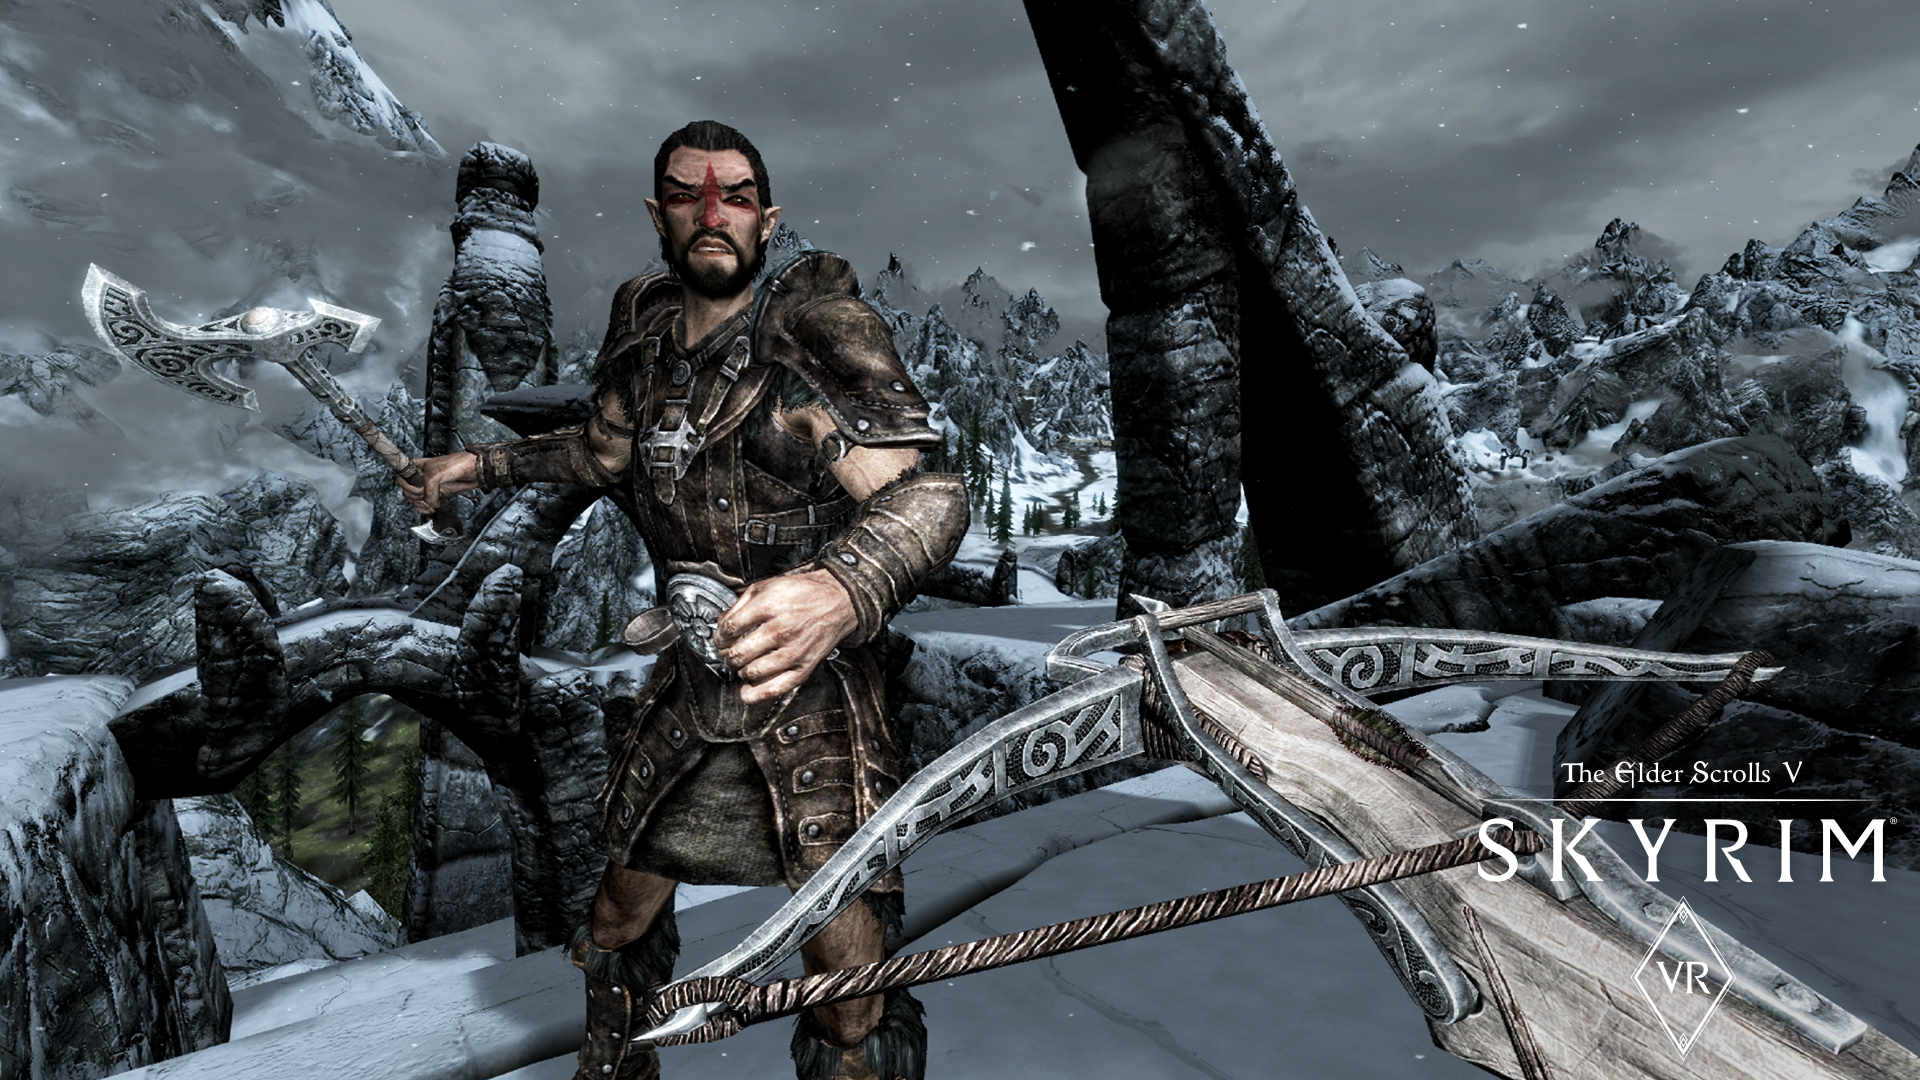 Bethesda Softworks LLC. Online Store - The Elder Scrolls V: Skyrim VR